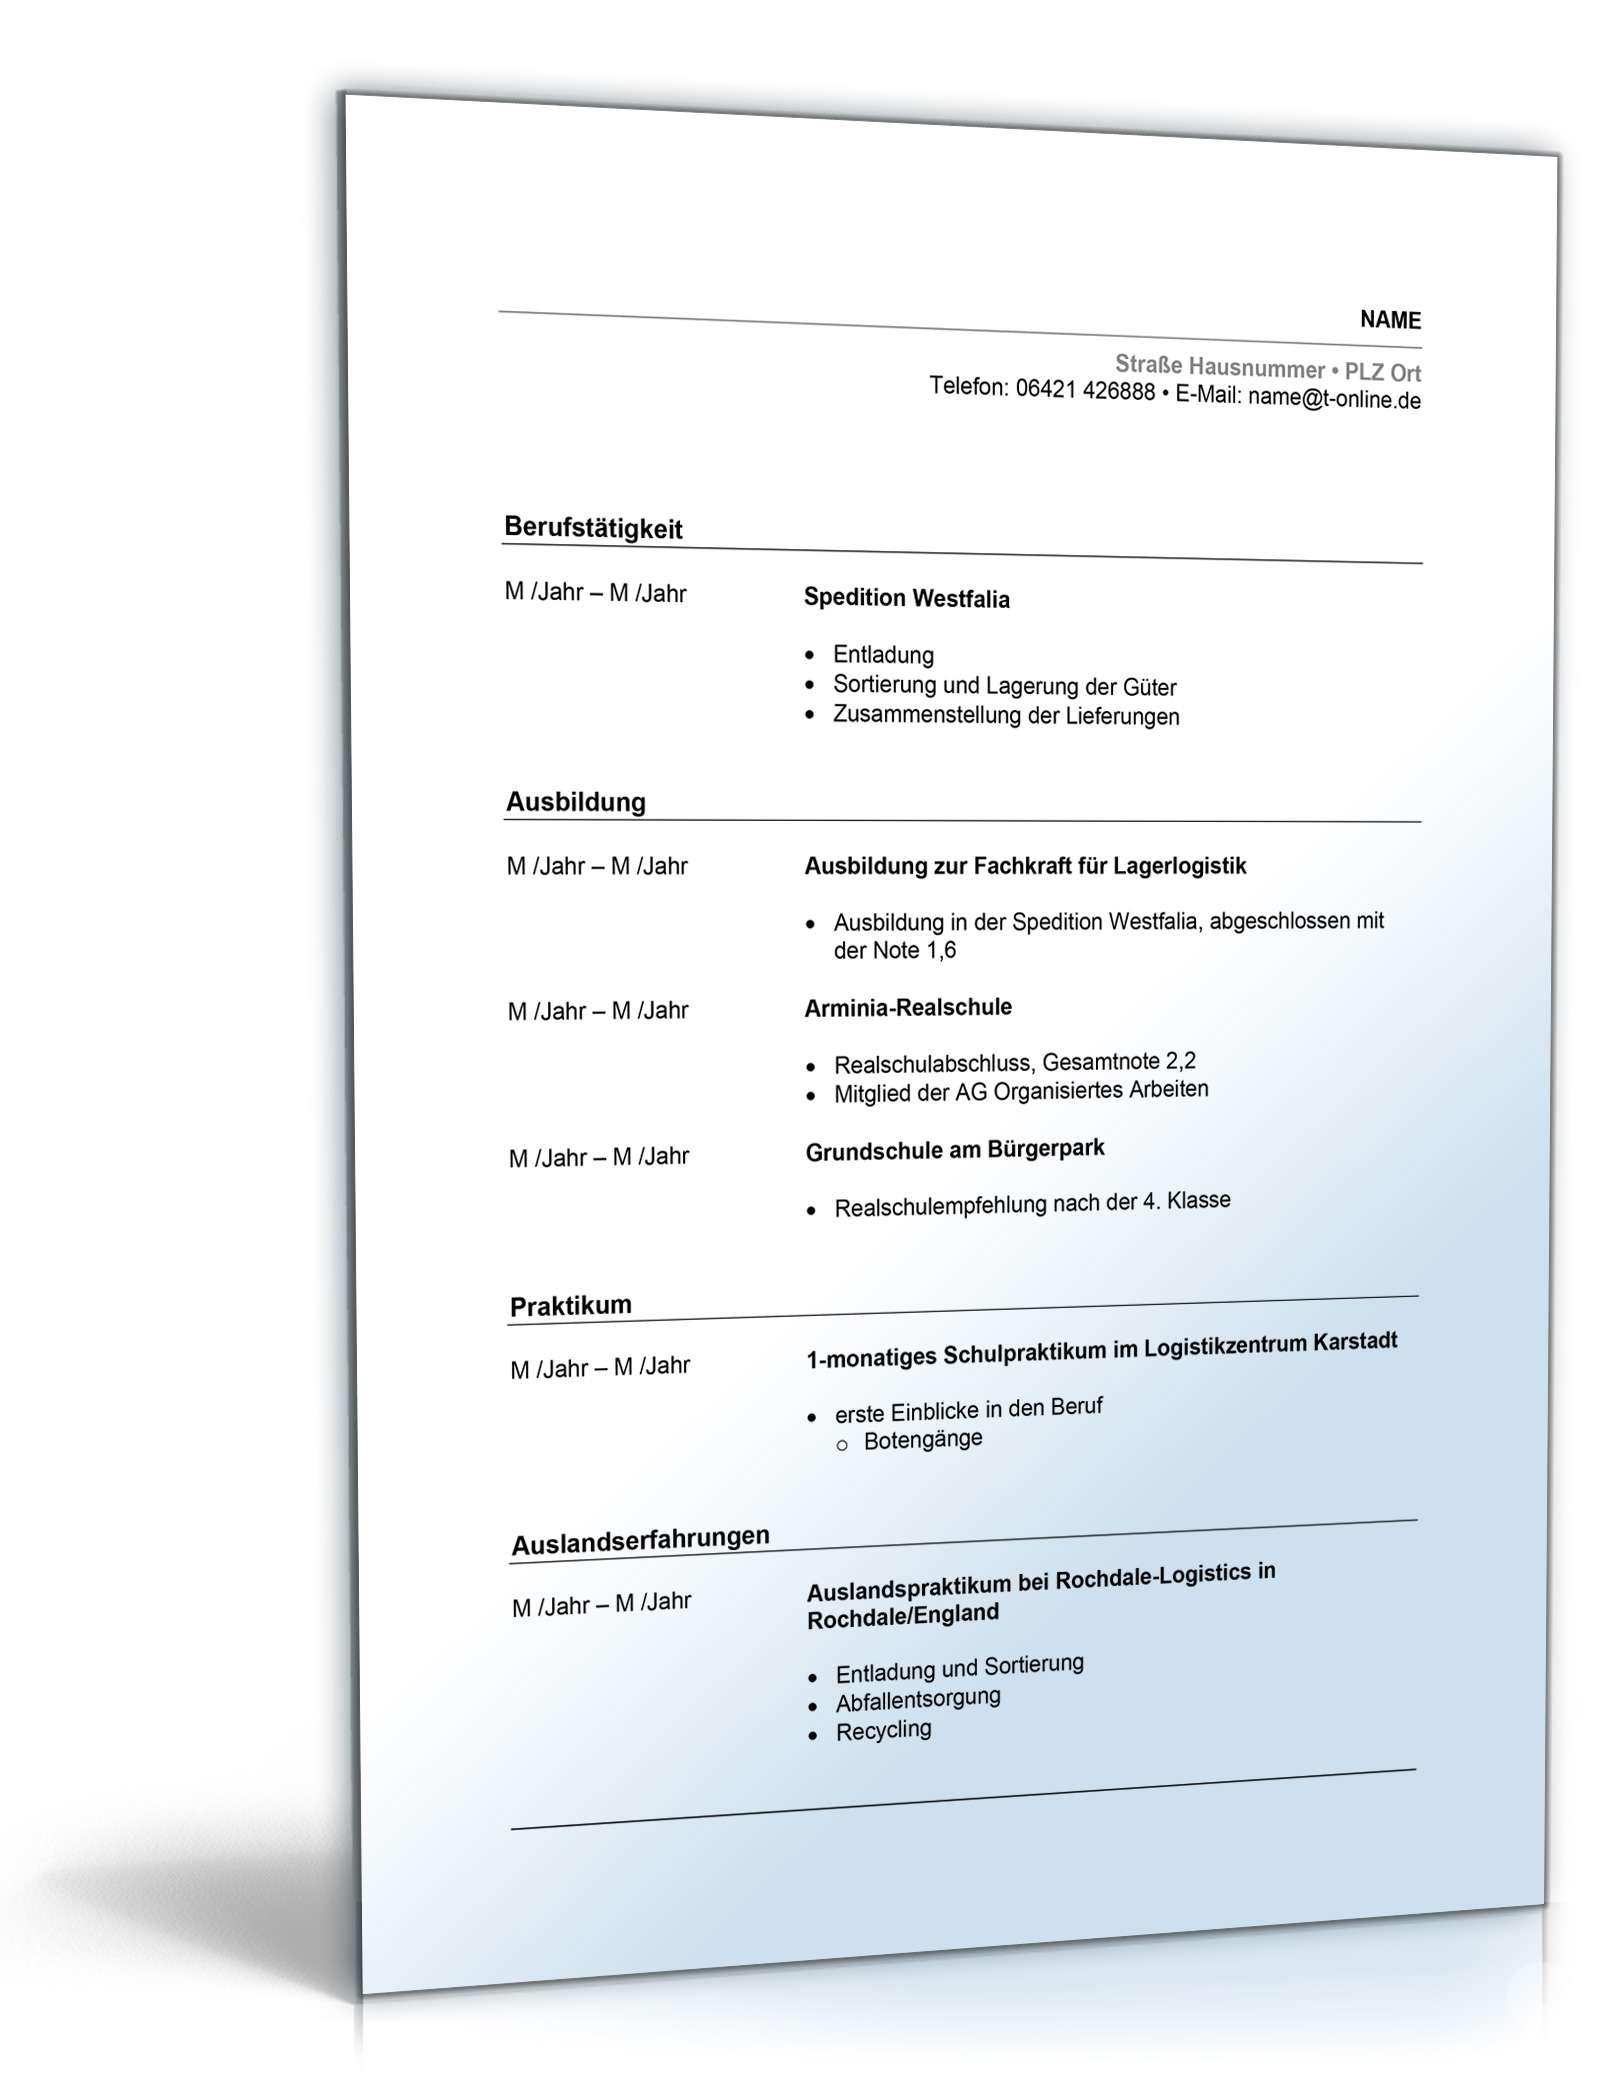 Lebenslauf Lagerlogistik | Muster zum Download